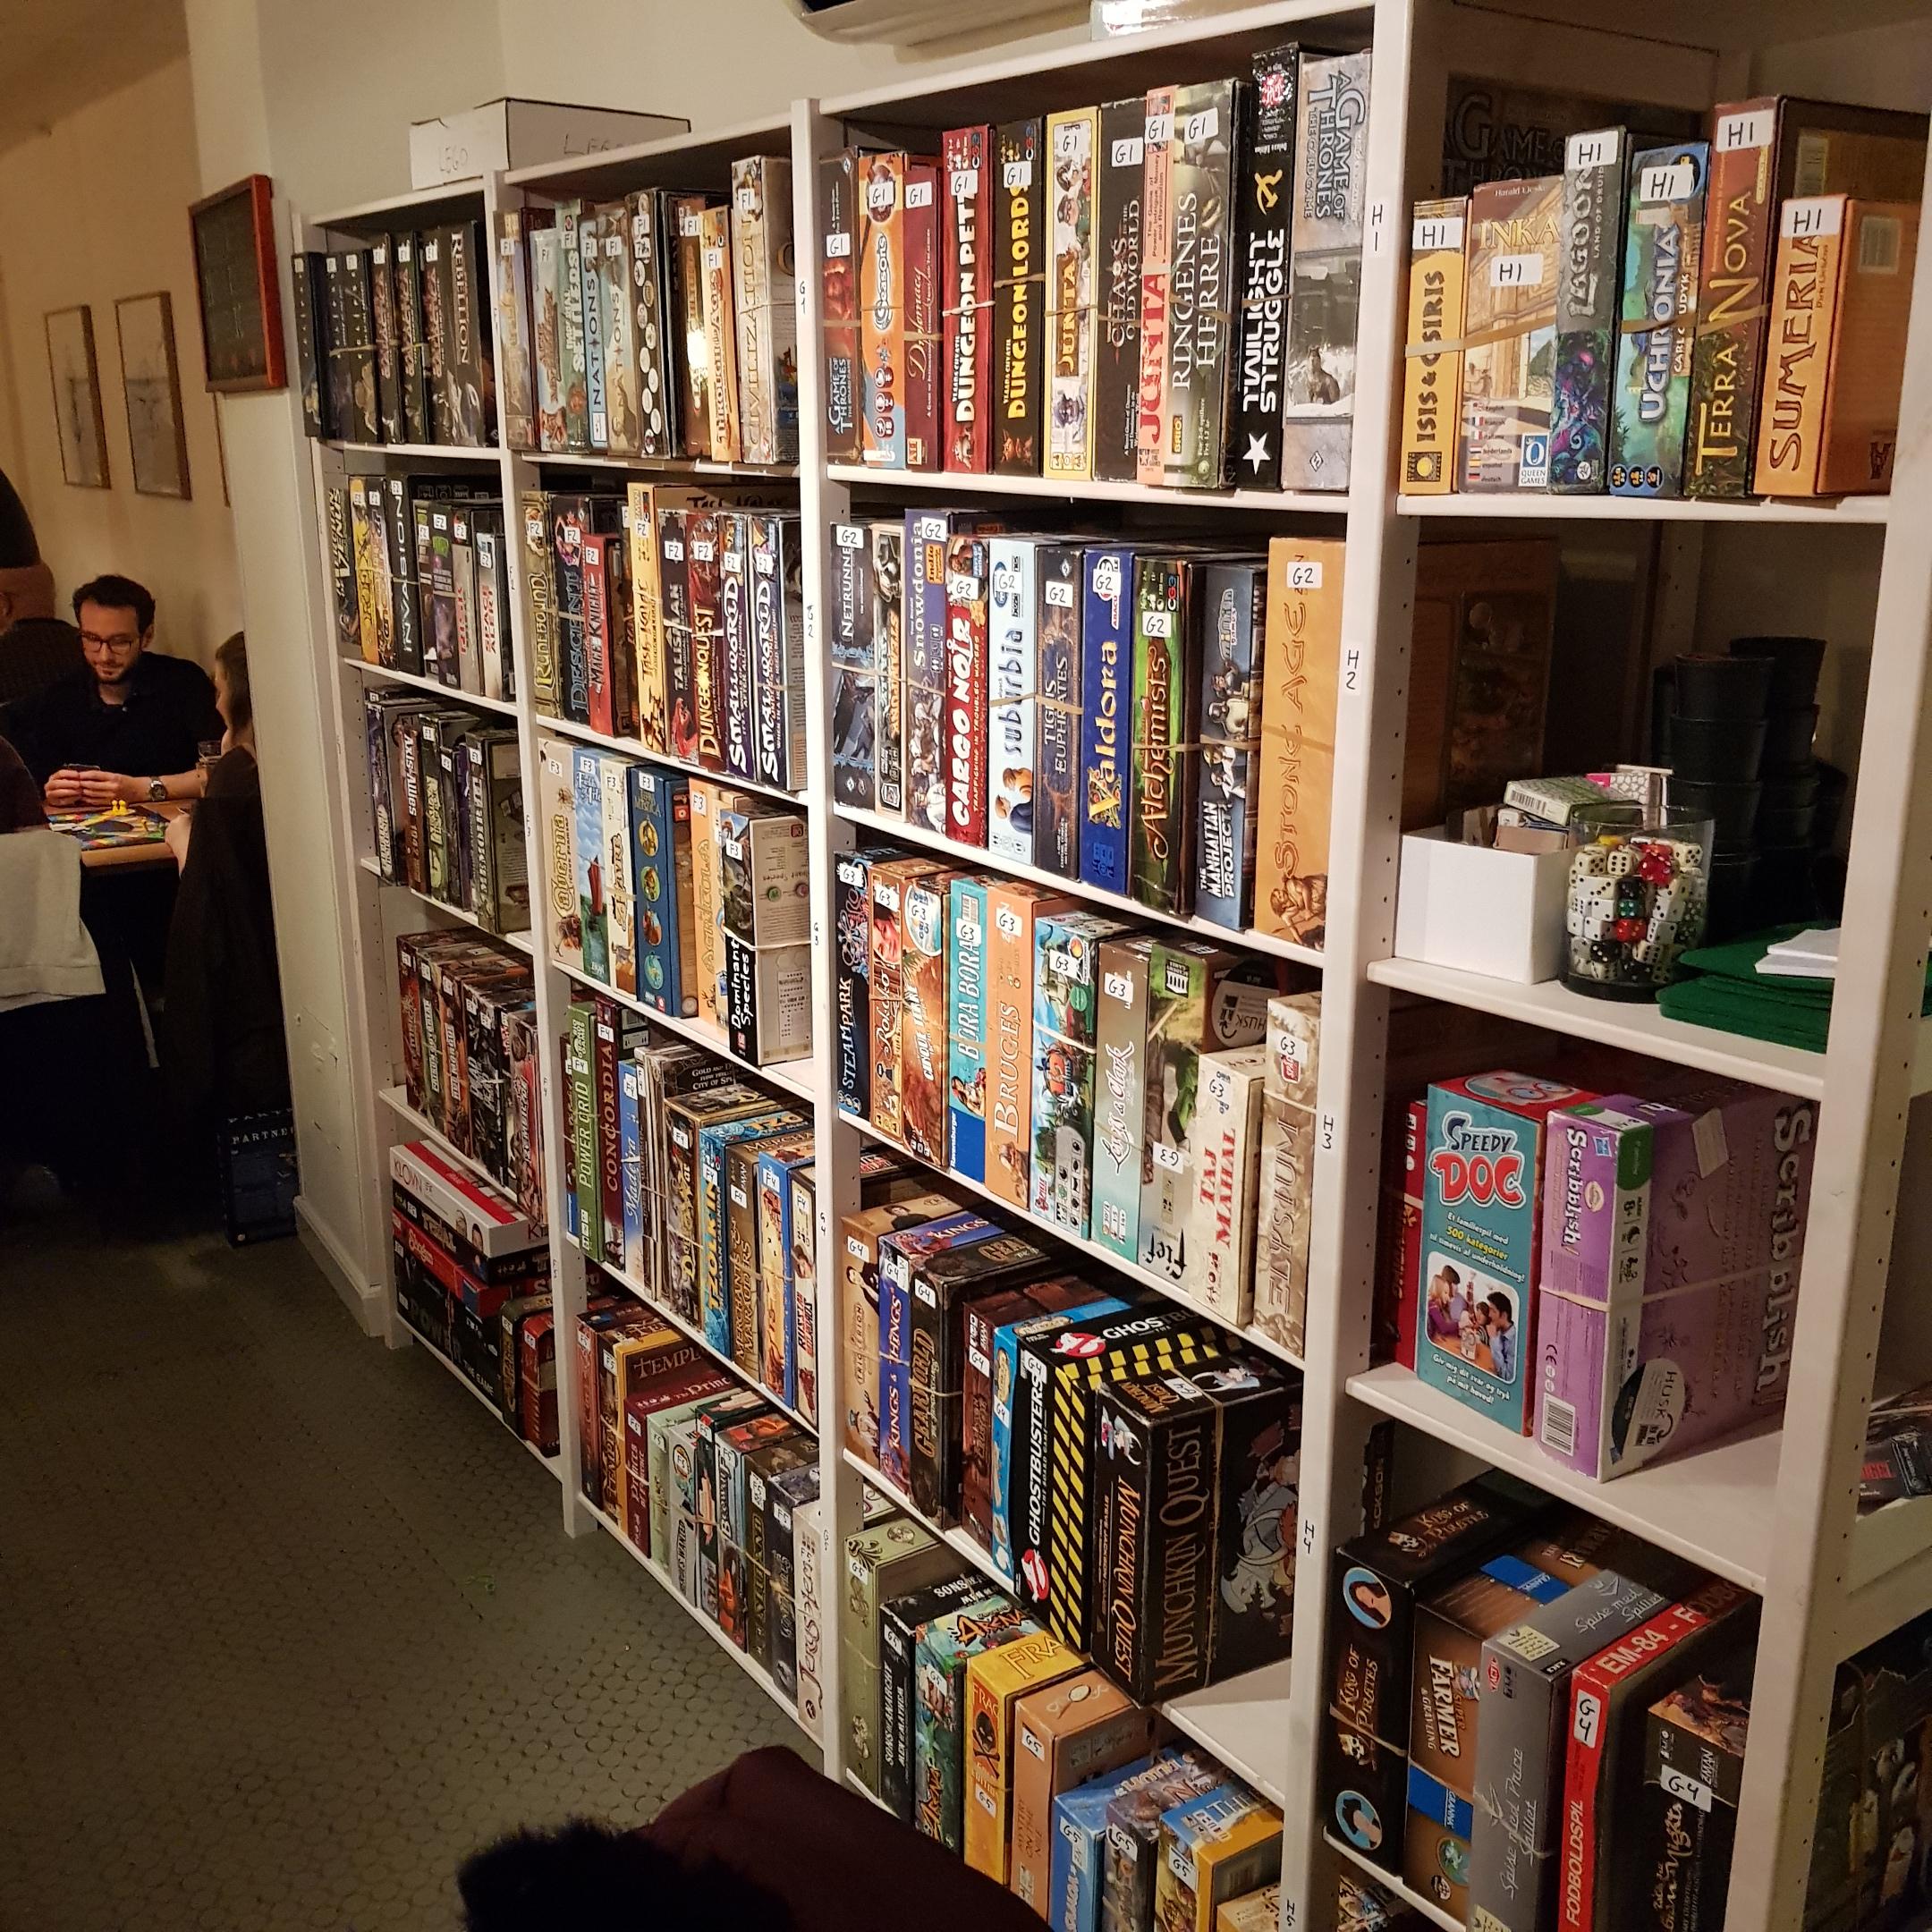 Pleasing The Board Game Shelves 1 Mattimus Primed Download Free Architecture Designs Scobabritishbridgeorg